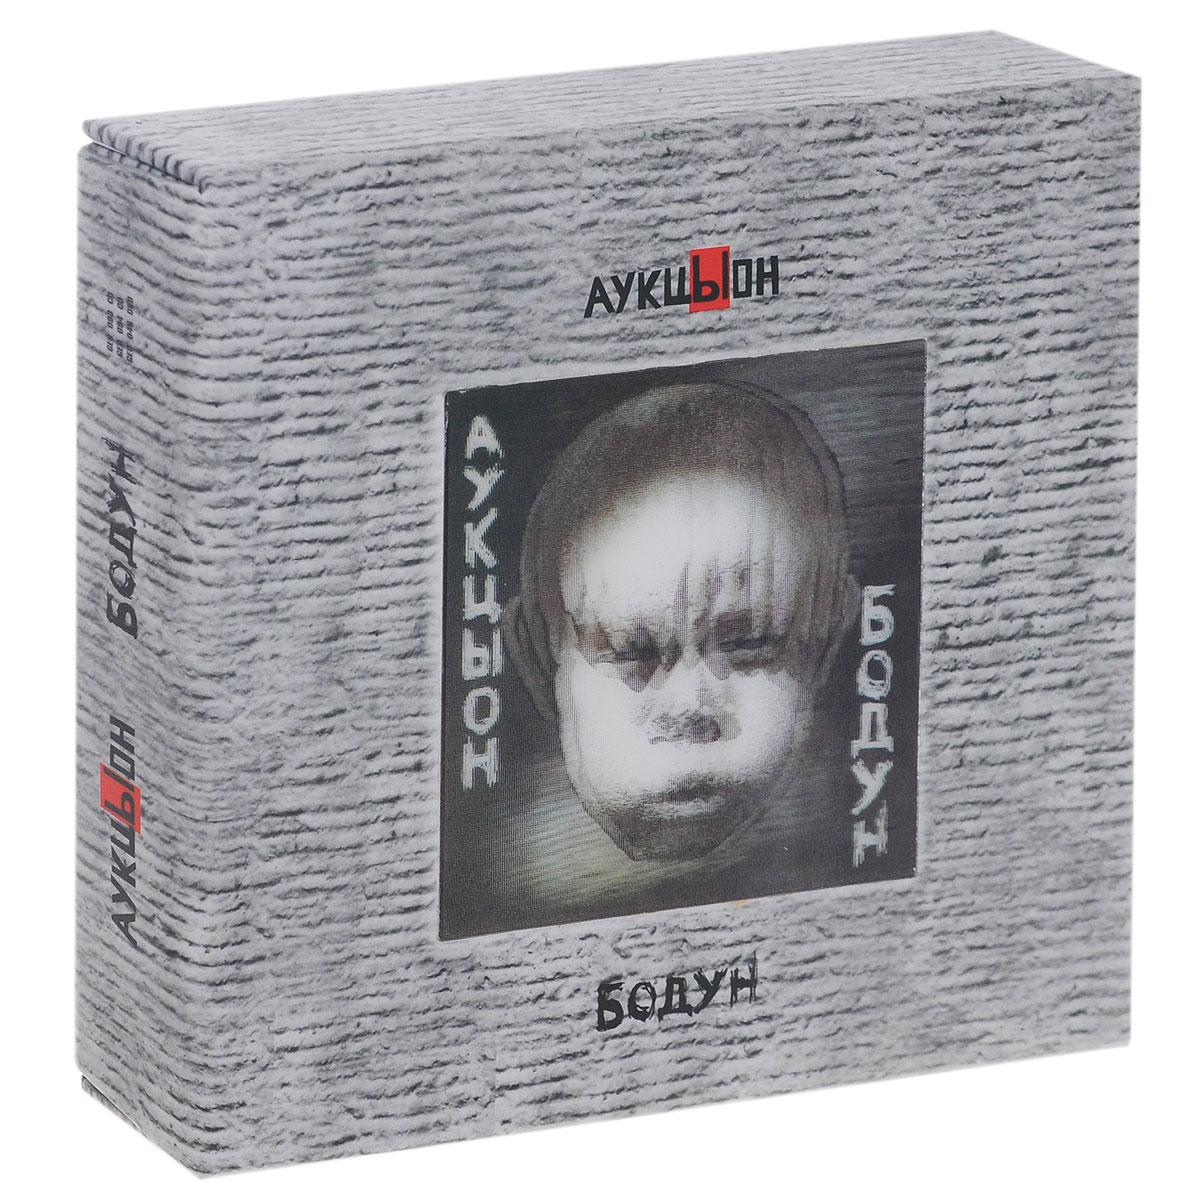 АукцЫон АукцЫон. Бодун (2 CD + DVD)